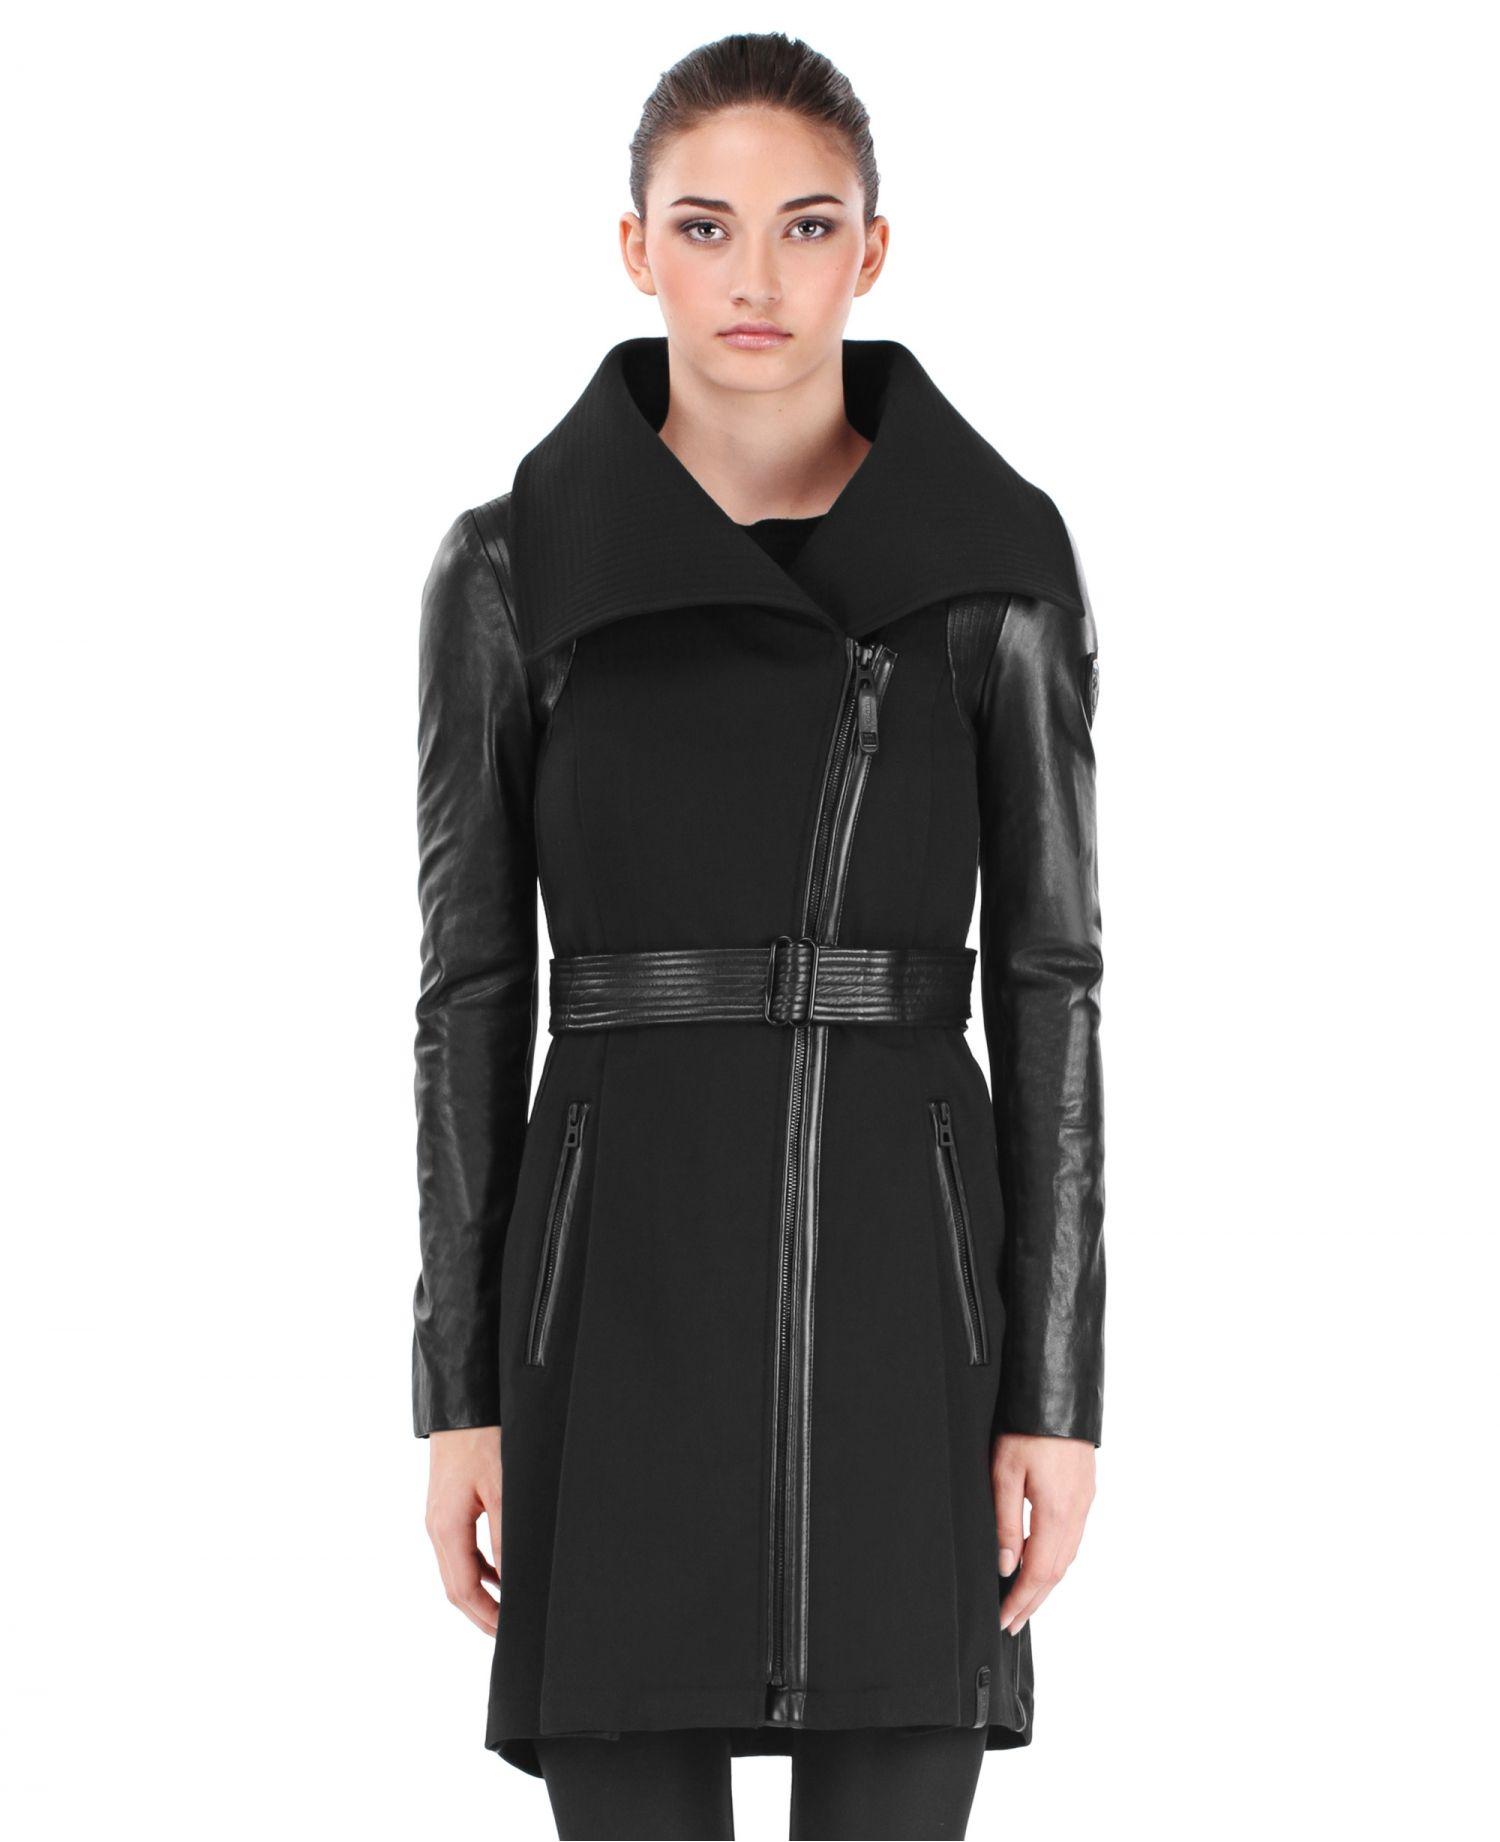 RUDSAK Outerwear (BLACK, TRANSITIONAL WEAVE GENUINE LAMB